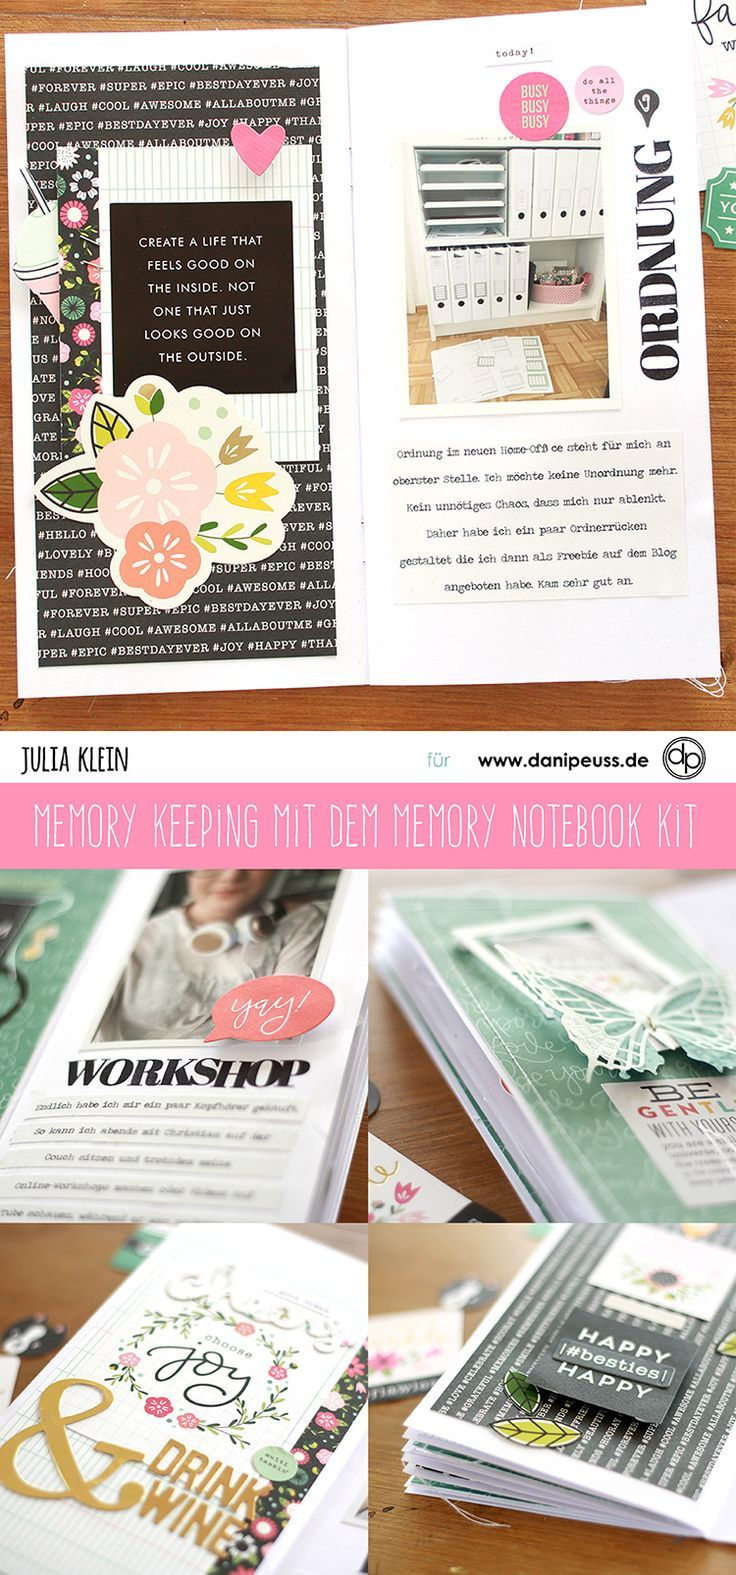 Memory Keeping mit dem September Memory Notebook Kit | von